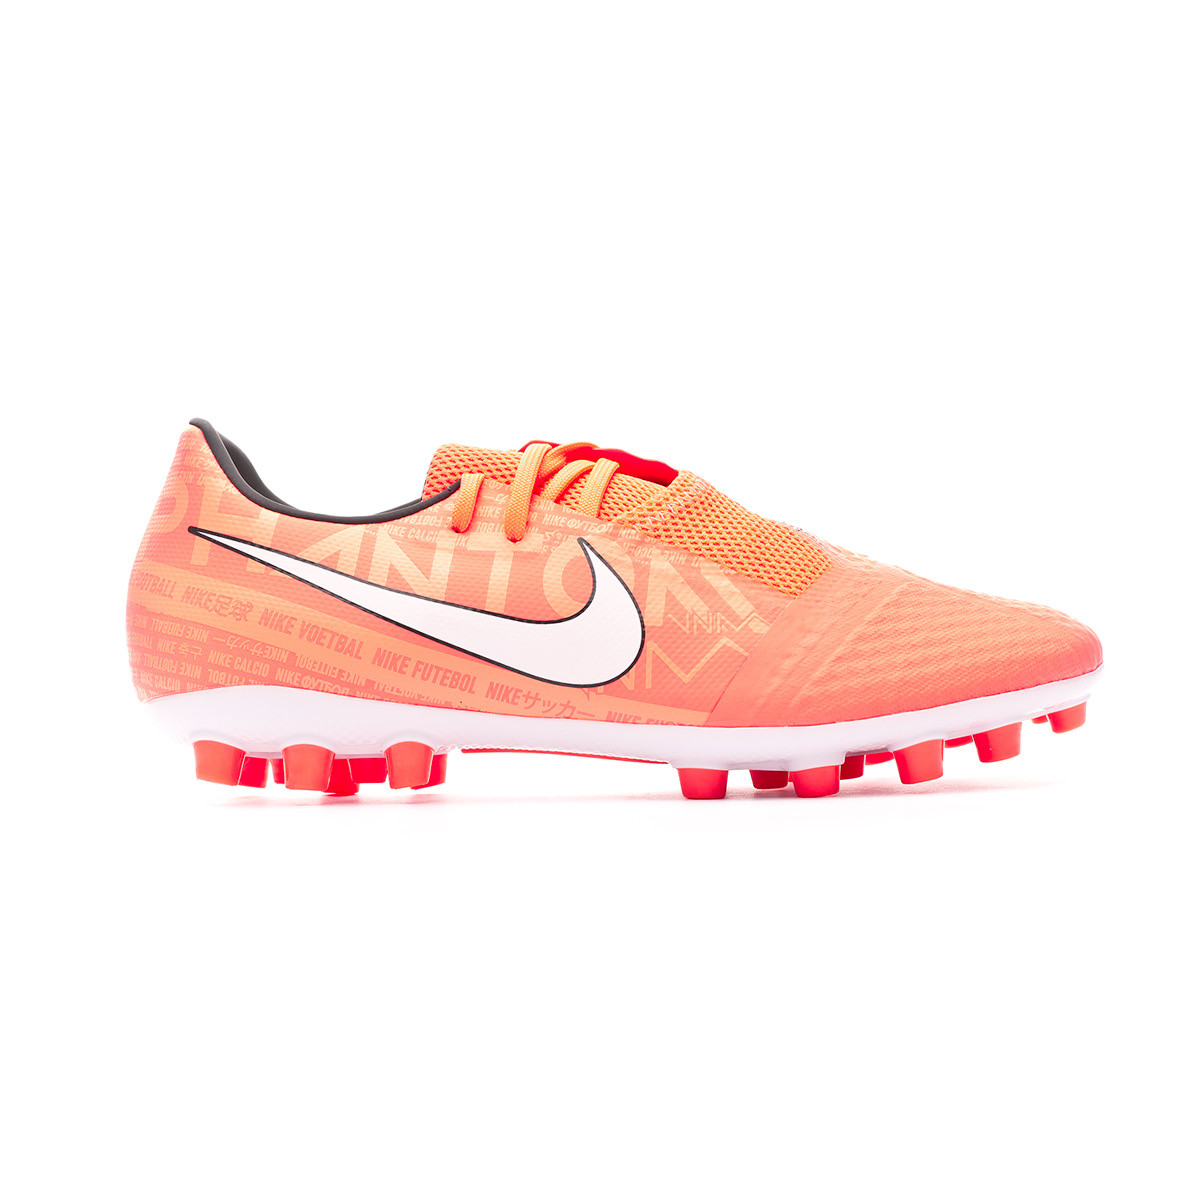 Vollständig trocken Bohren Stirnrunzeln  Football Boots Nike Phantom Venom Academy AG Bright mango-White-Orange  pulse - Football store Fútbol Emotion